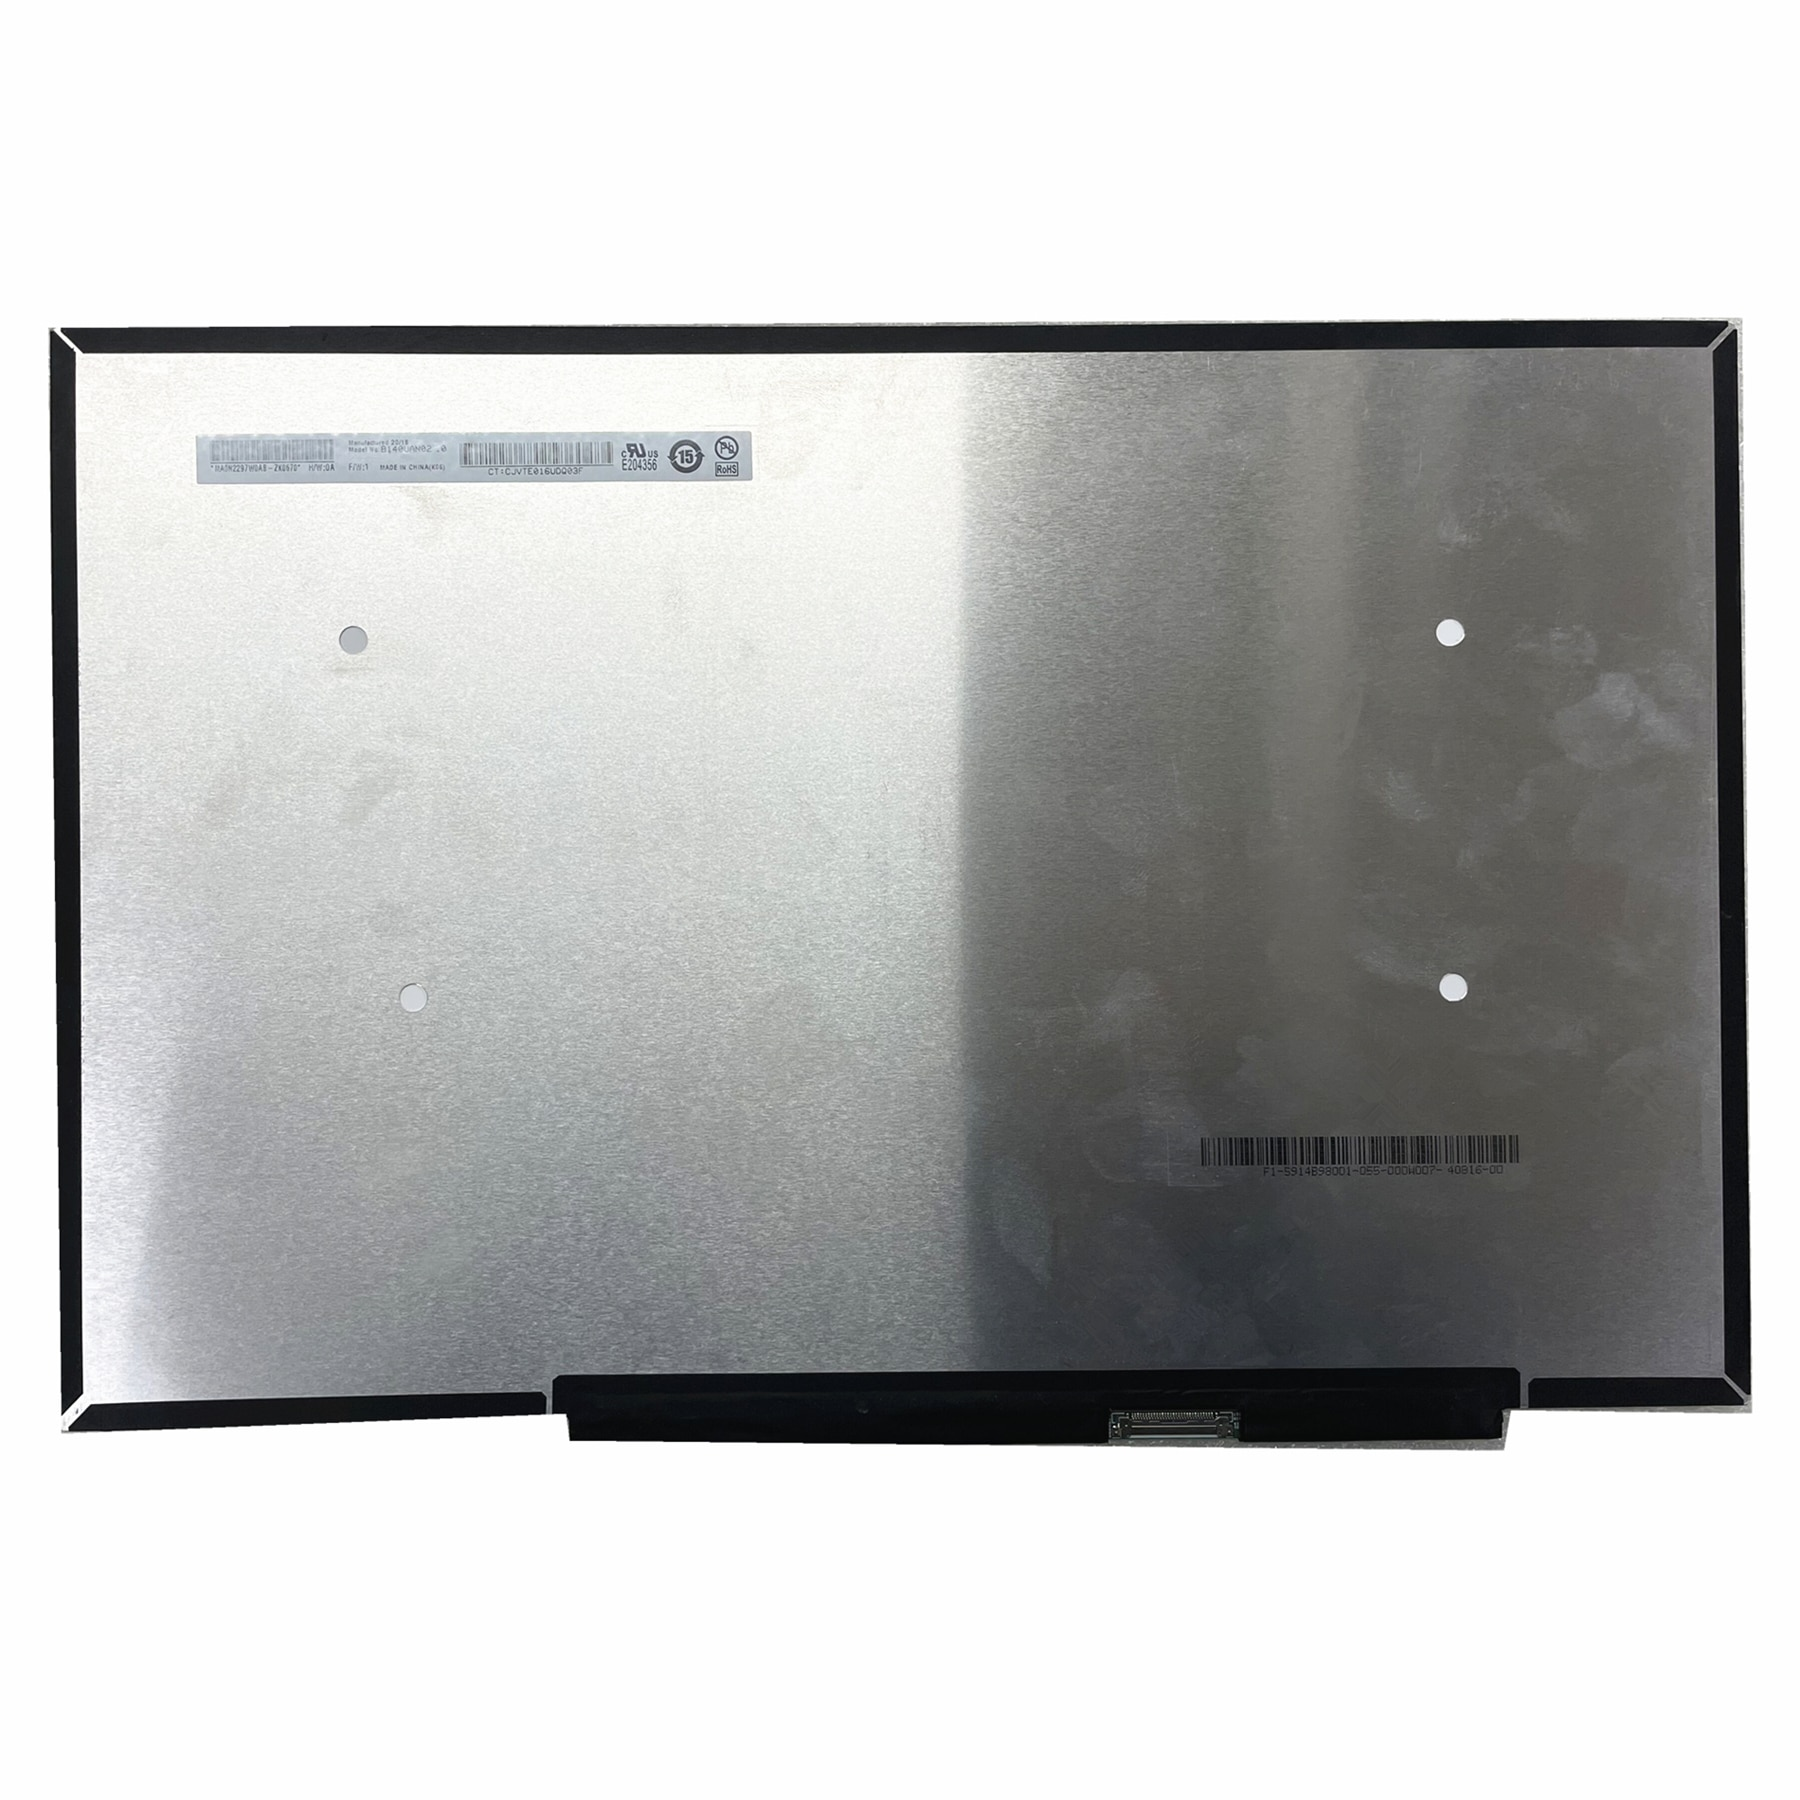 M30902-001 ل HP Envy 14-eb 14T-EB HP ENVY كمبيوتر محمول 14-EB شاشة إل سي دي لكمبيوتر دفتري 14 بوصة 16:10 1920x1200 IPS